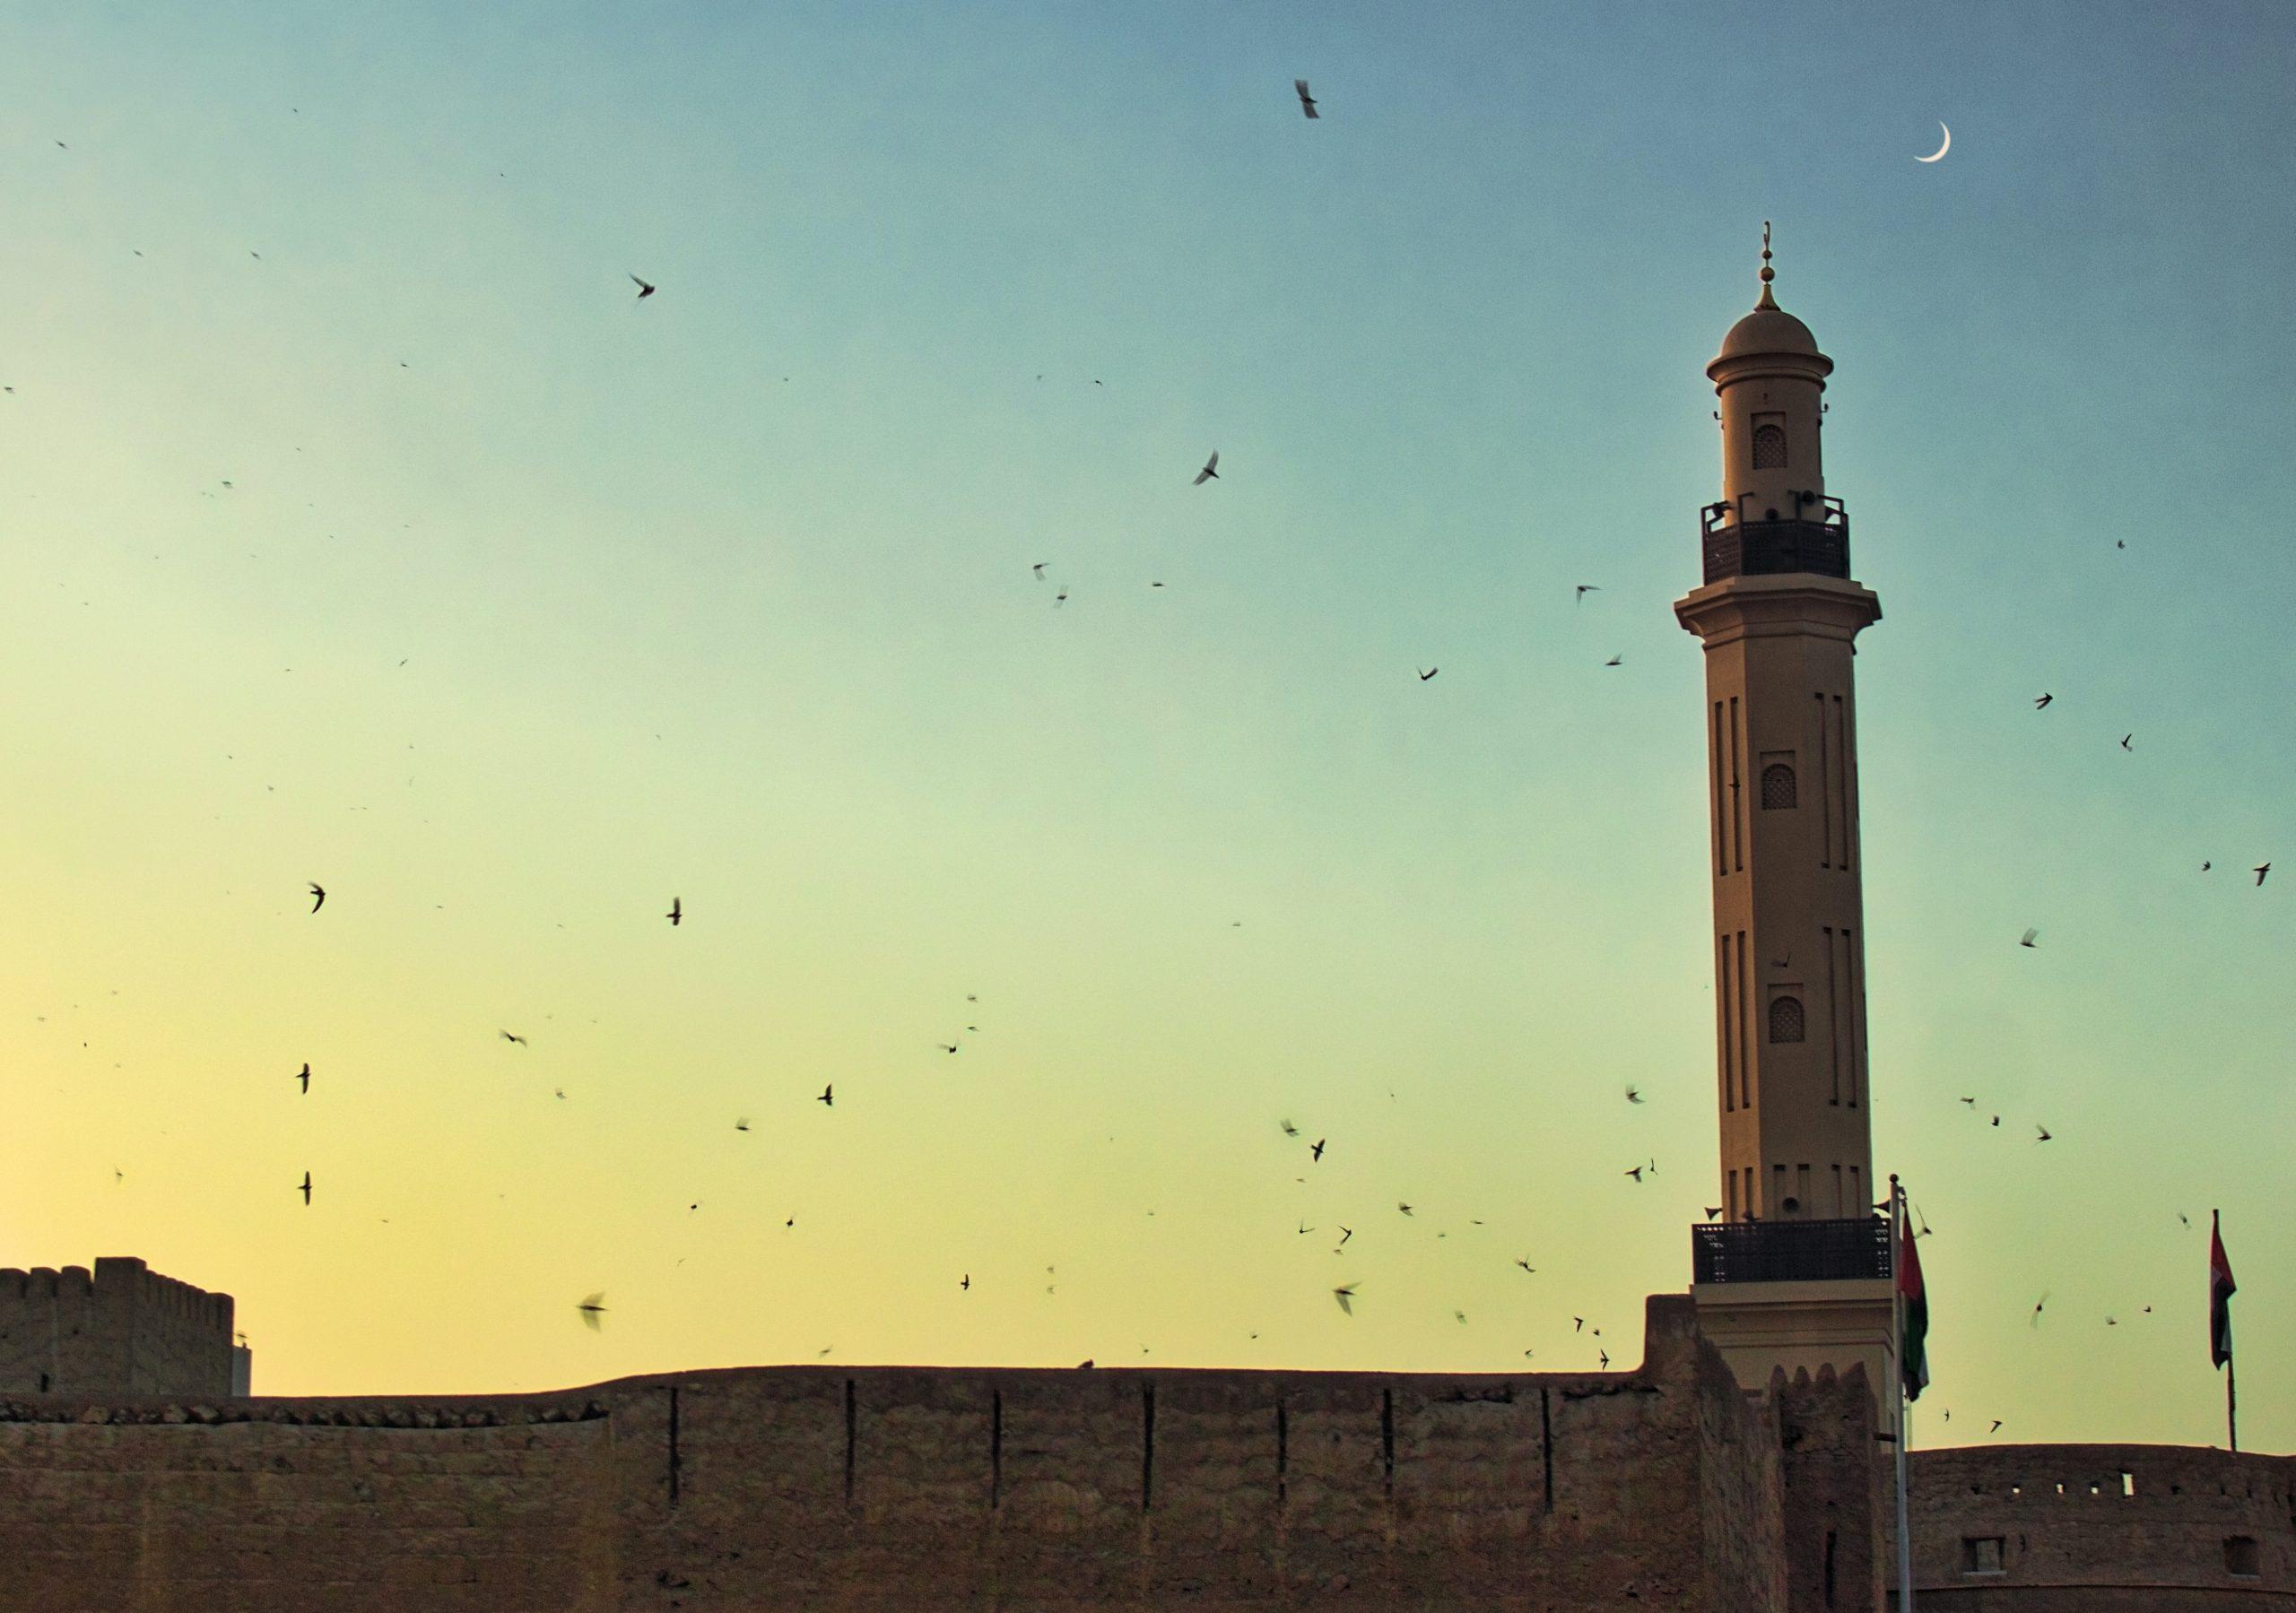 Hindi poetry on holy festival Ramadan - एक ऐसी ईद > अर्चना की रचना